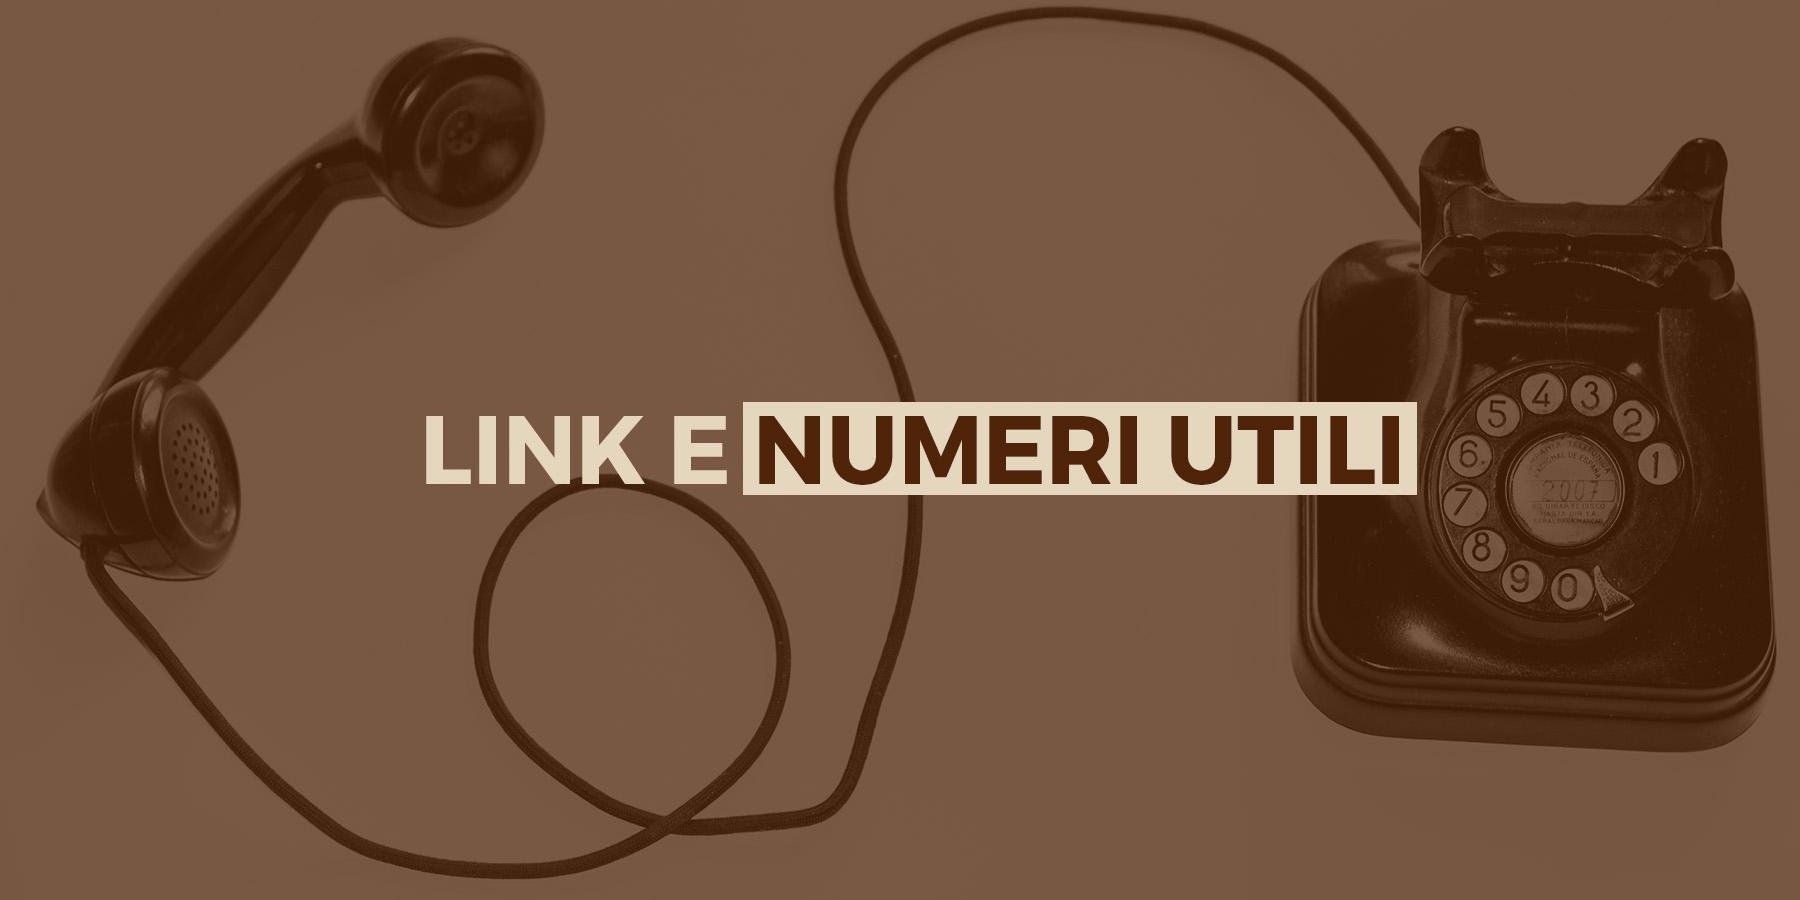 StartUno-link-numeri-utili